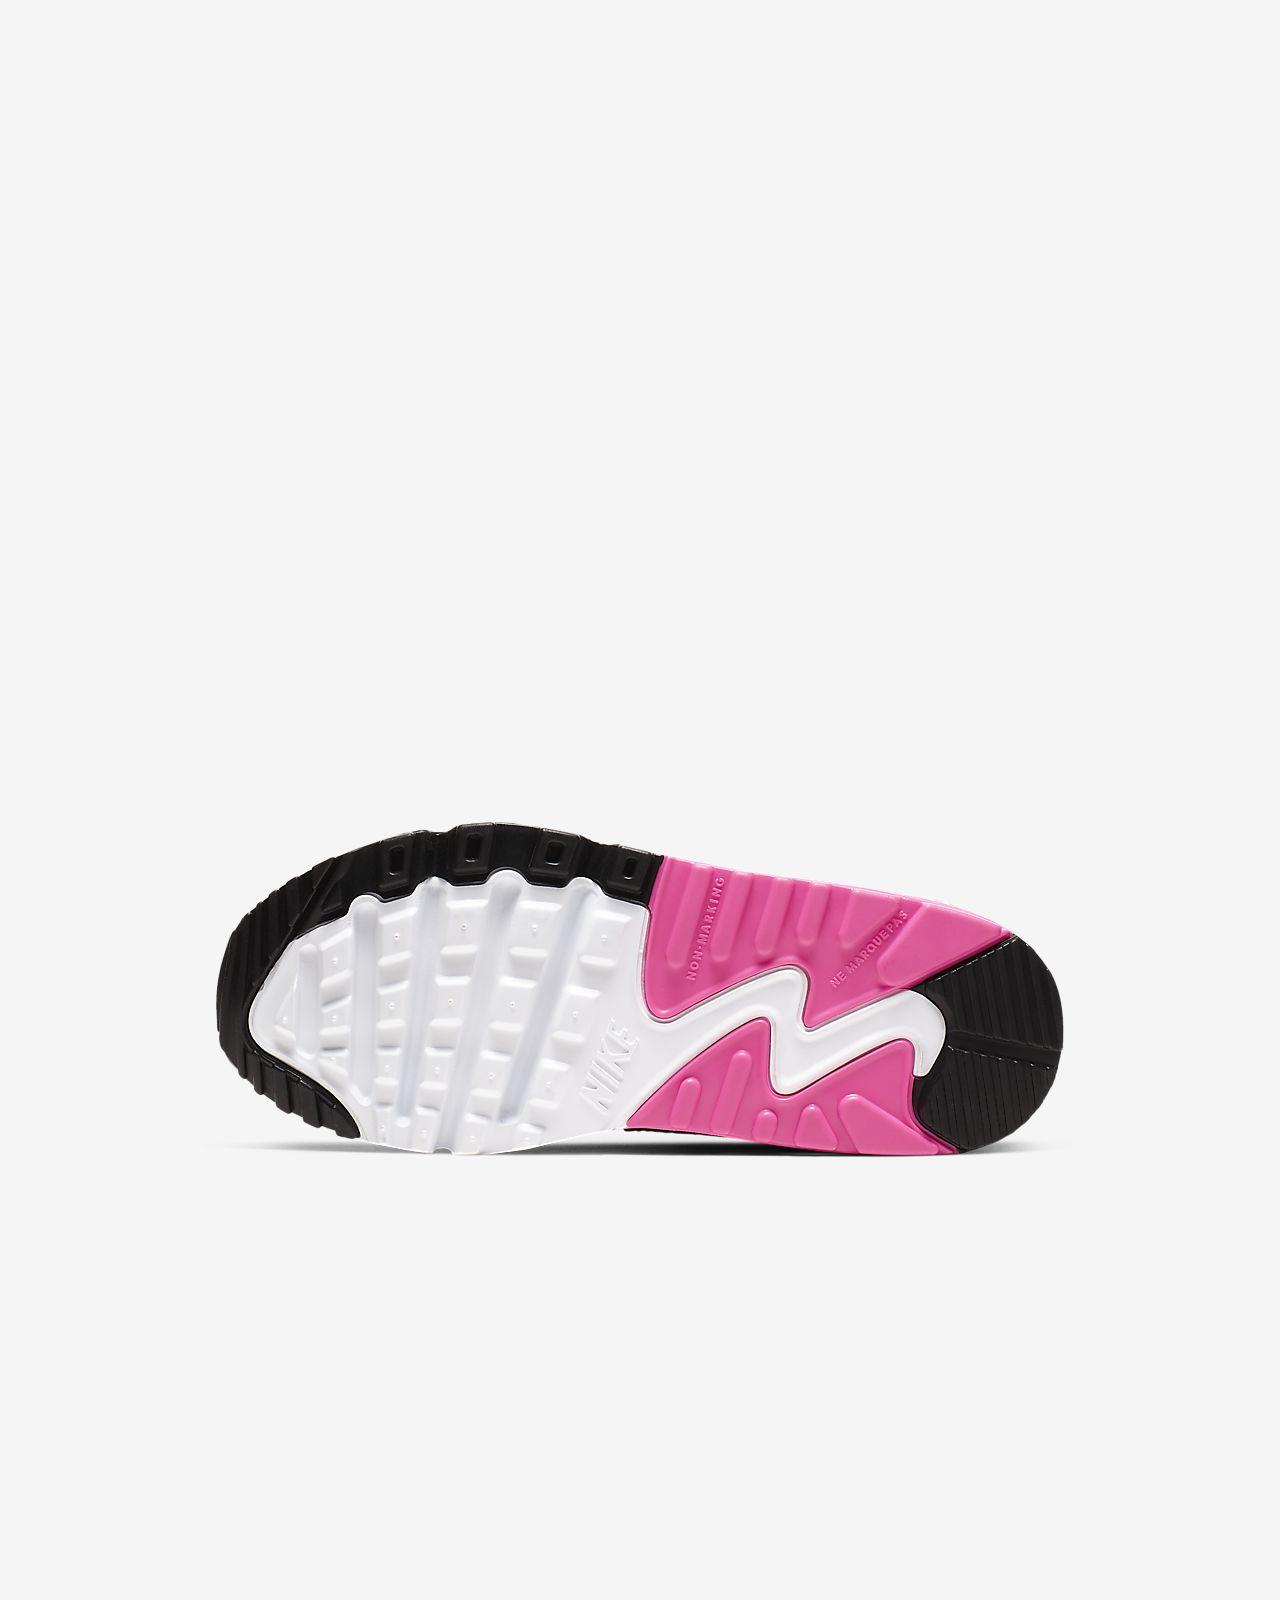 cheaper 5c4e1 34fbd Nike Air Max 90 Leather Little Kids' Shoe